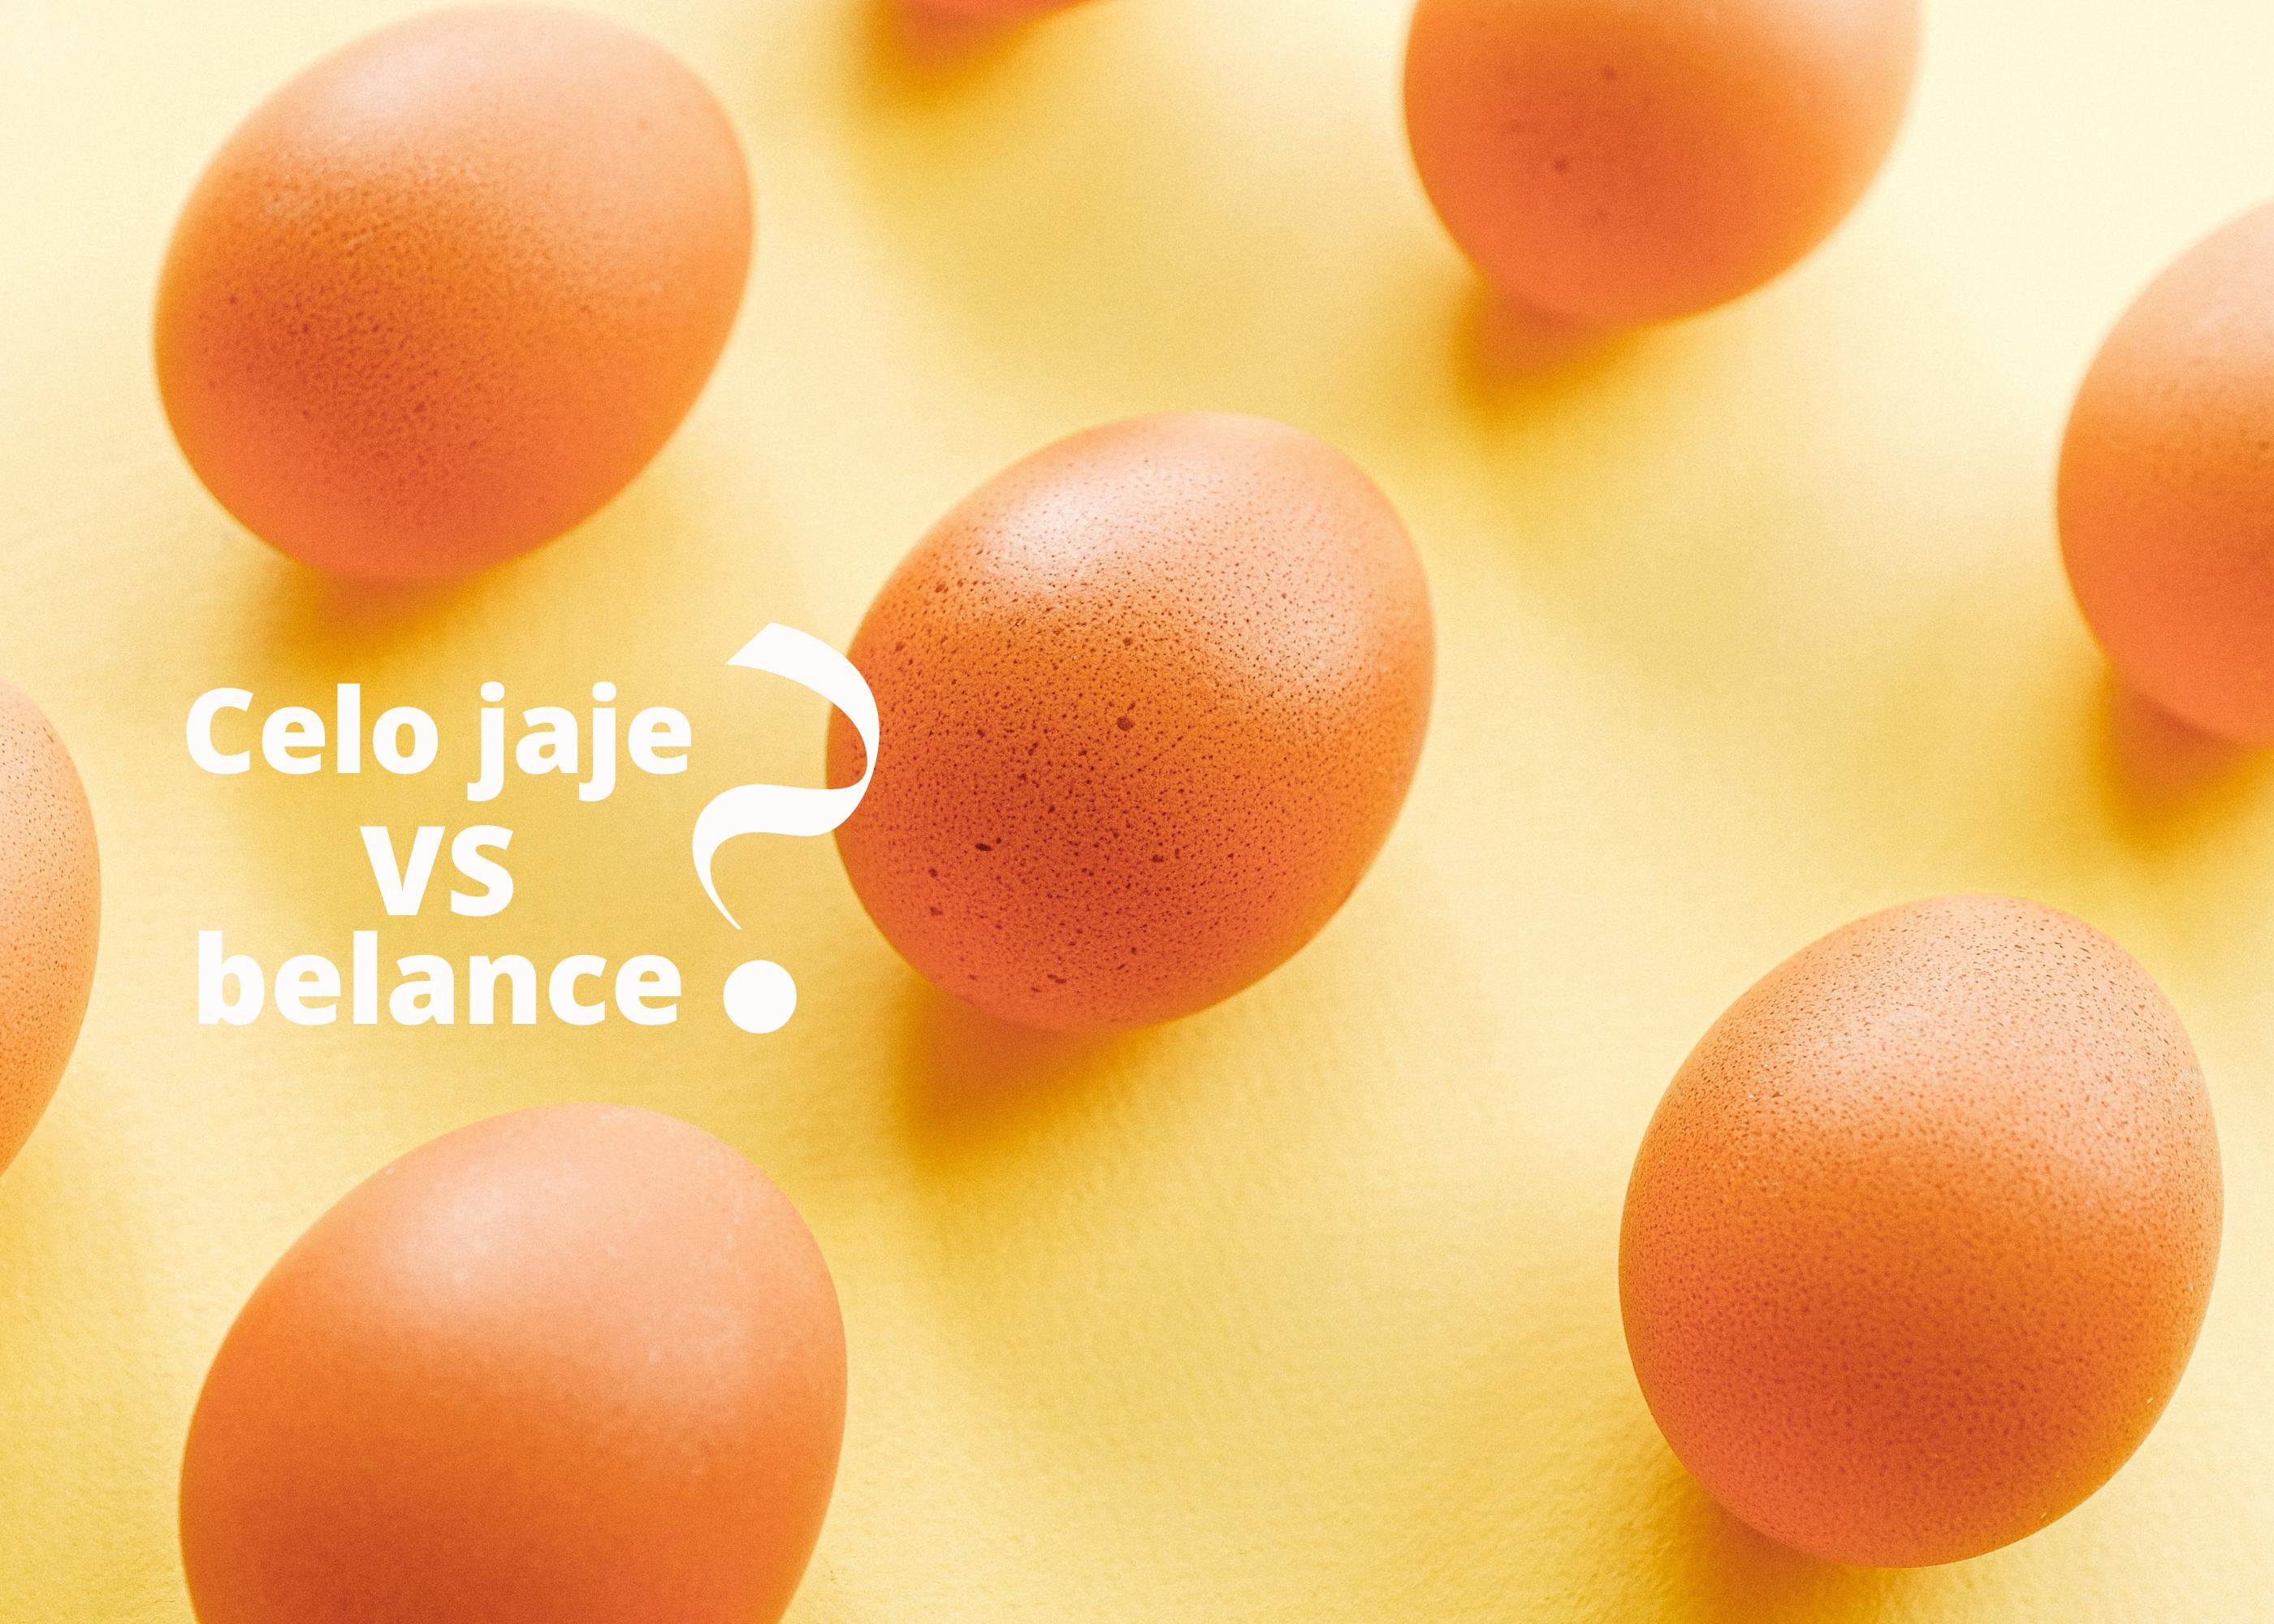 Celo jaje vs belance